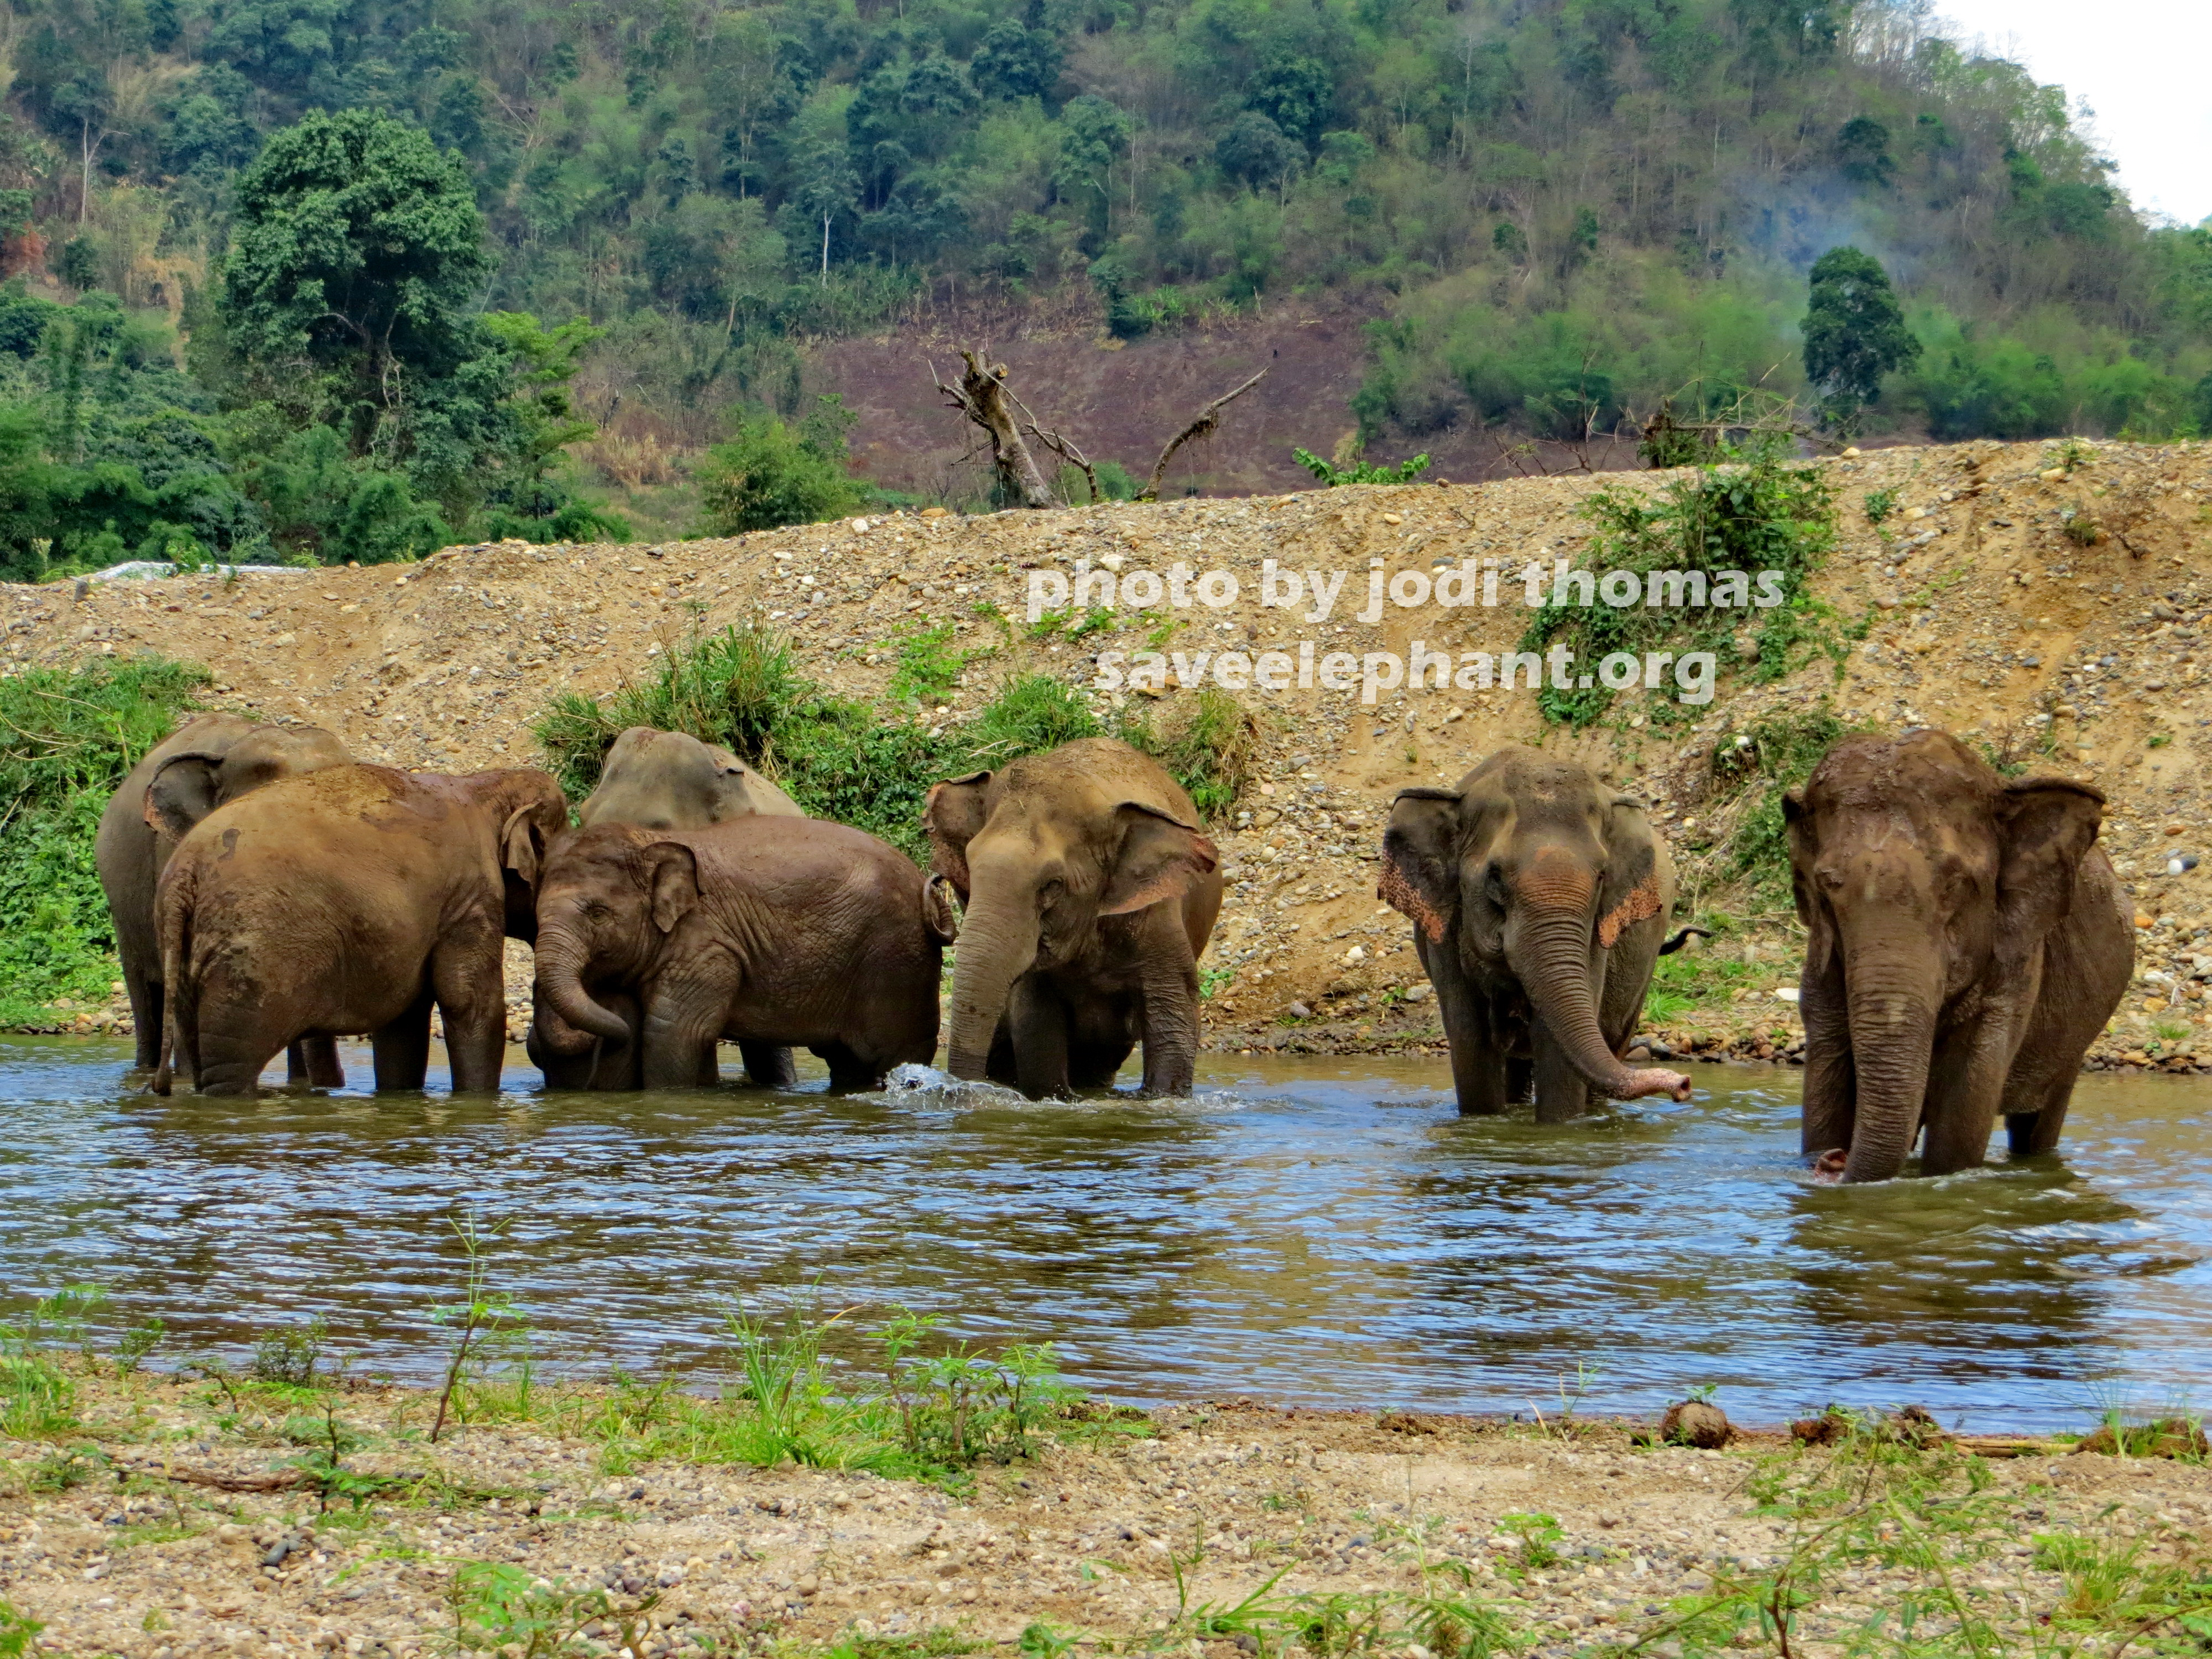 Baby Elephant Navanns New Nanny  Save Elephant Foundation